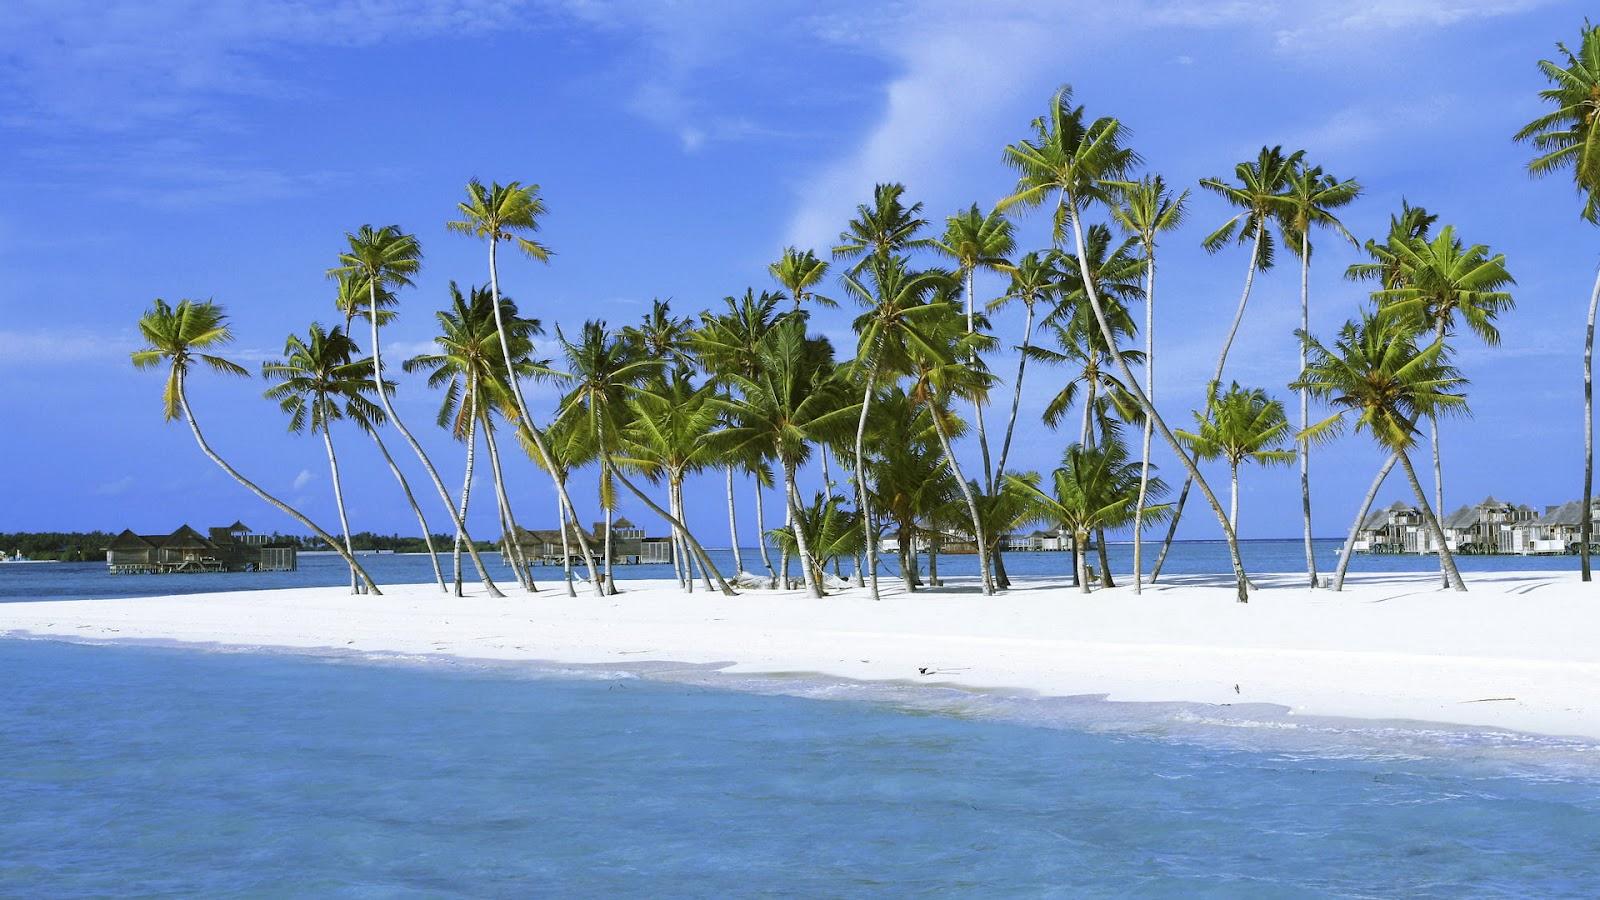 Beach scenes for desktop beautiful wallpapers natural for Nice home wallpaper